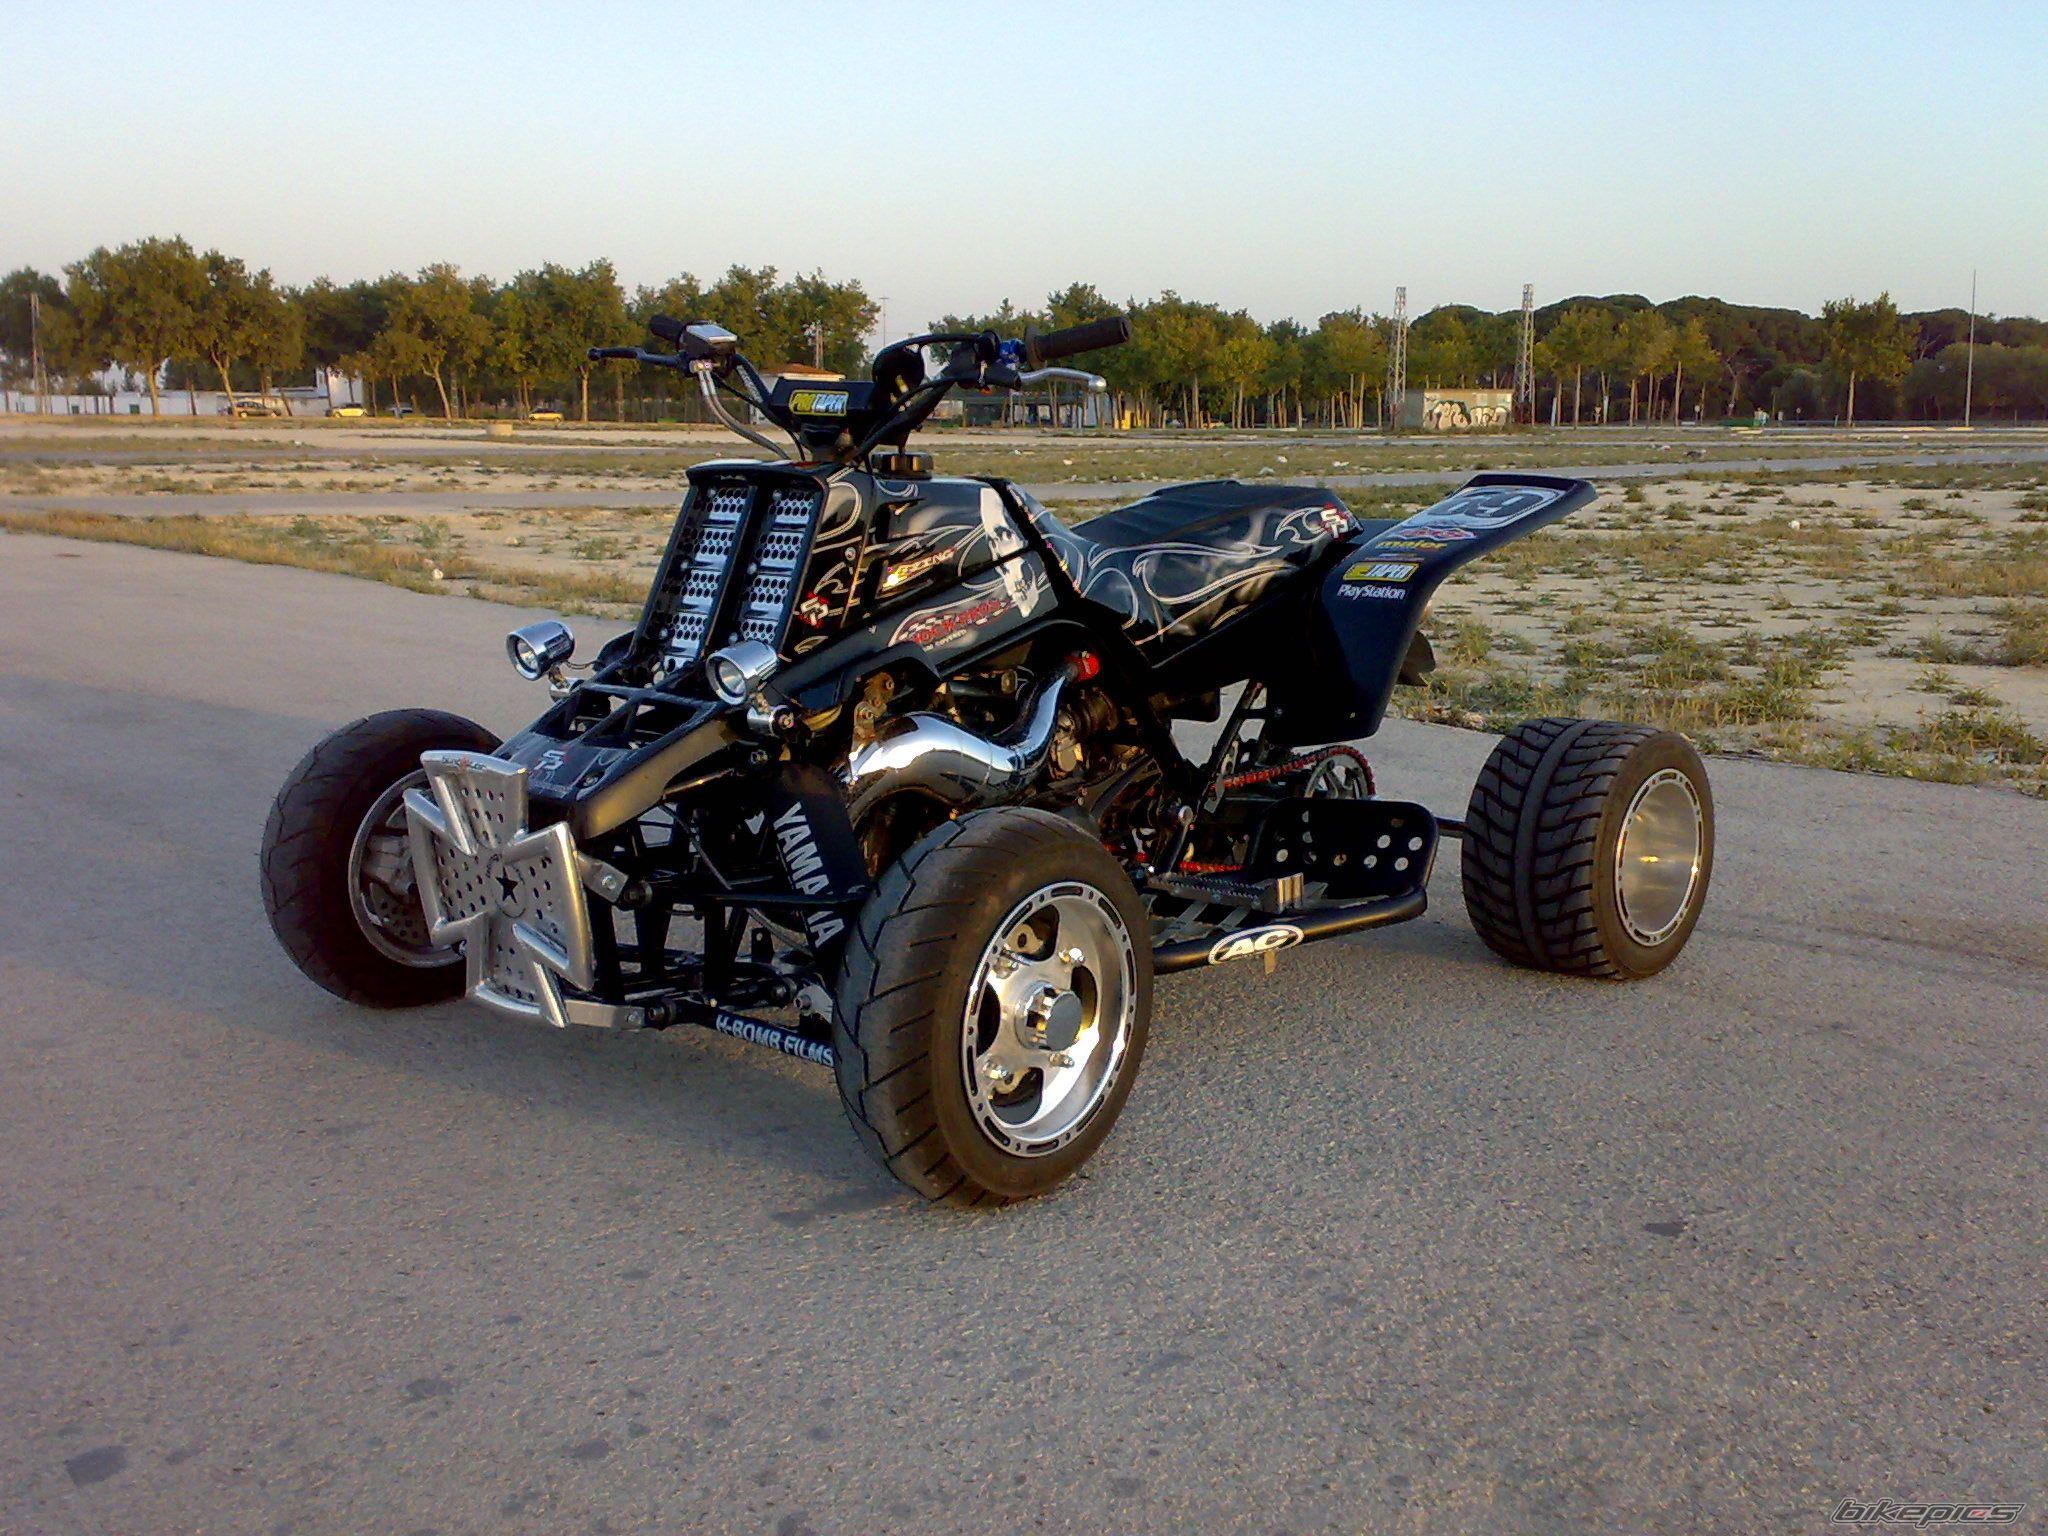 Four Wheelers Mx : Yamaha banshee atv quad offroad motorbike bike dirtbike